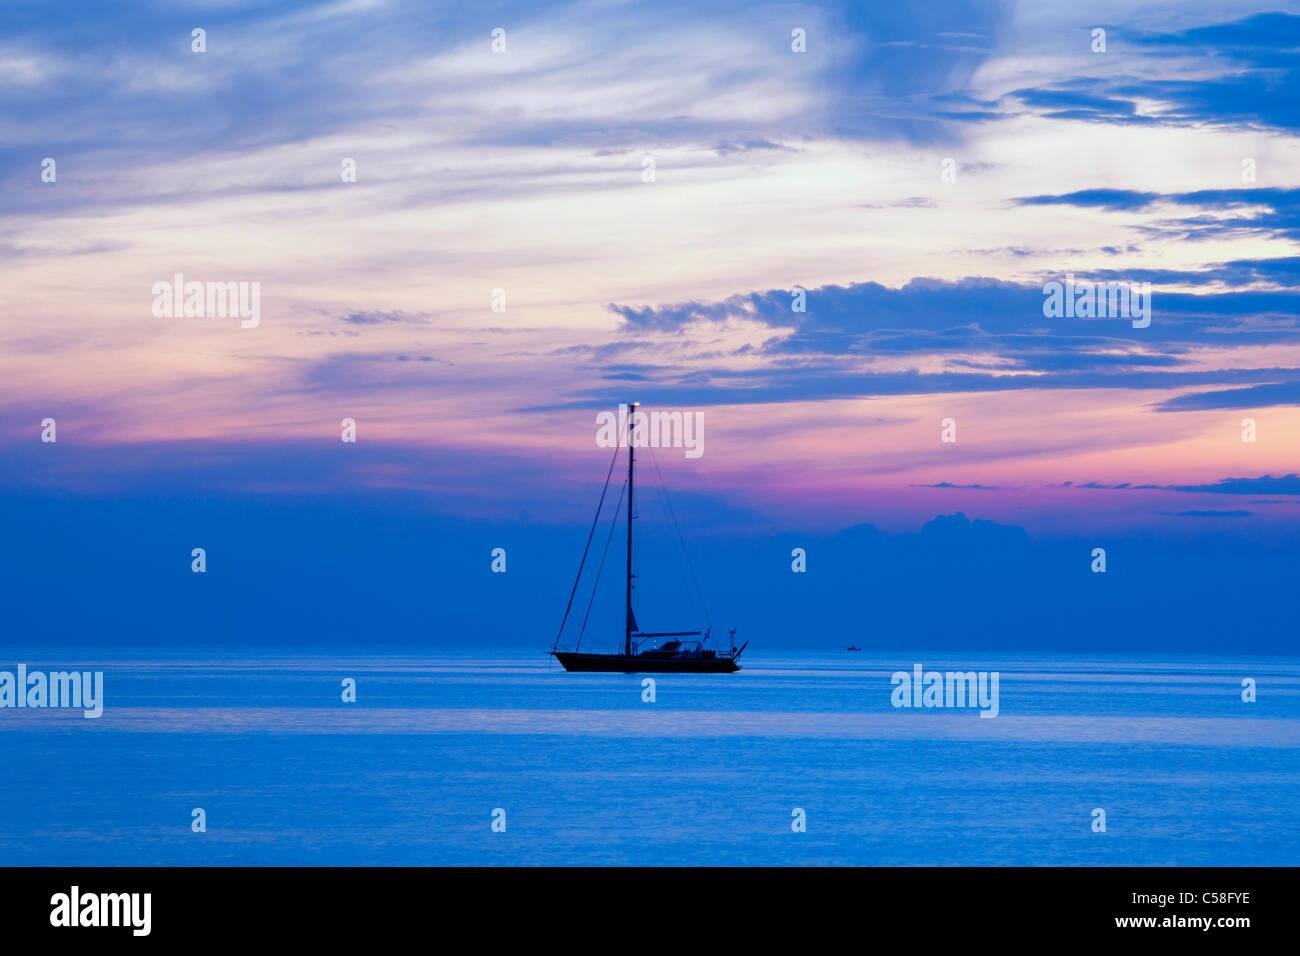 Adriatic, adventure, anchored, boat, clouds, Croatia, dusk, horizon, journey, leisure, nature, nautical, reflection, - Stock Image